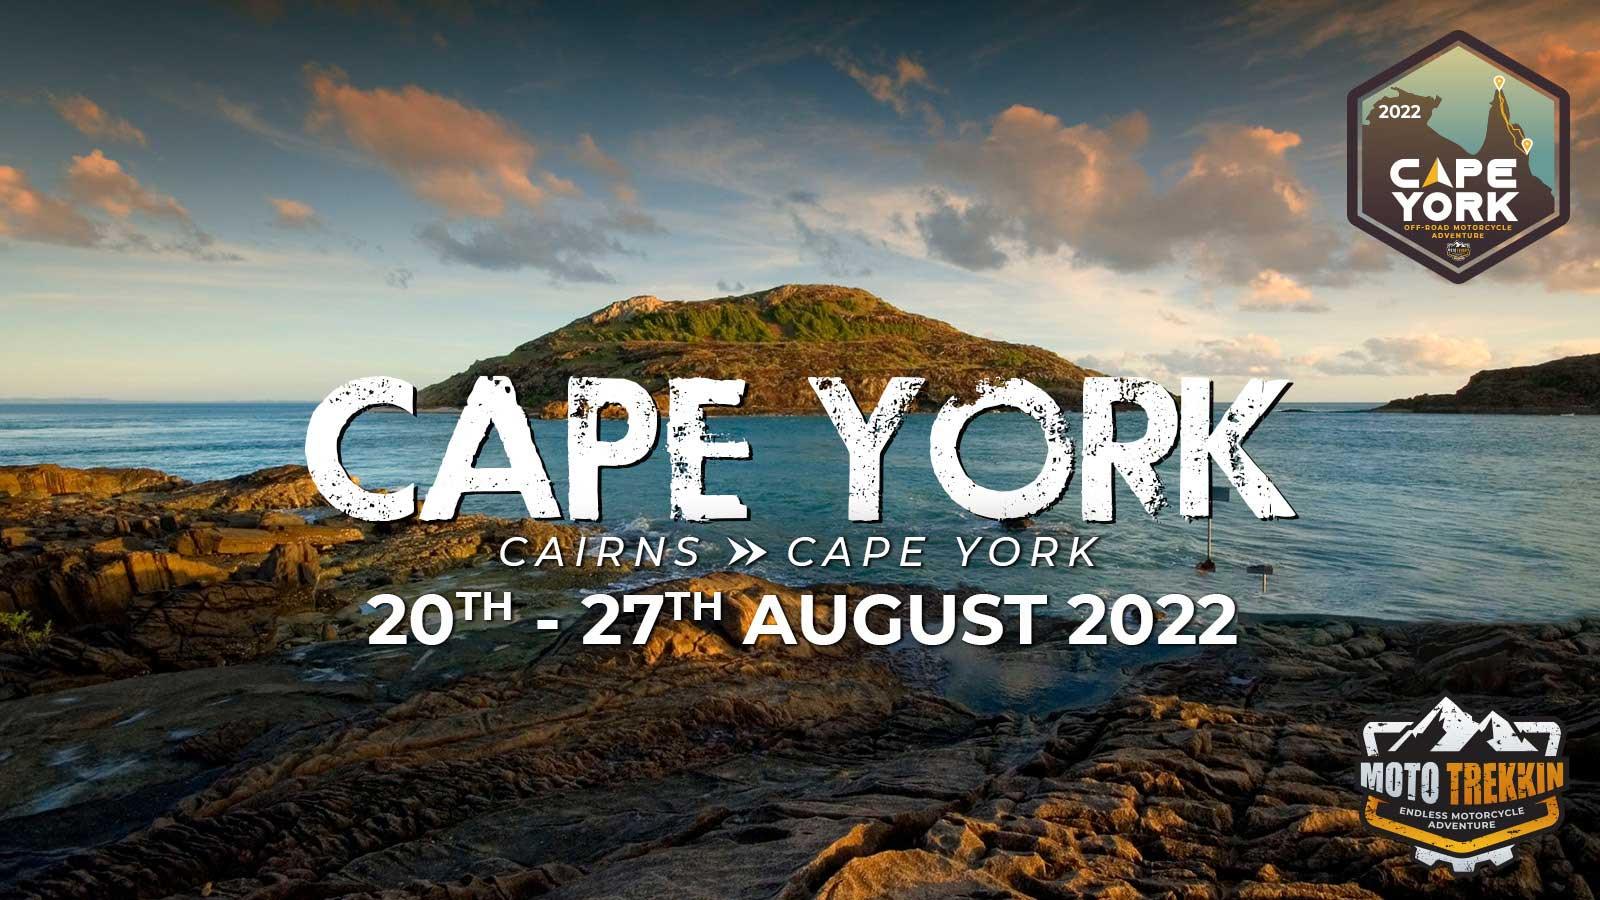 Cape York 2022